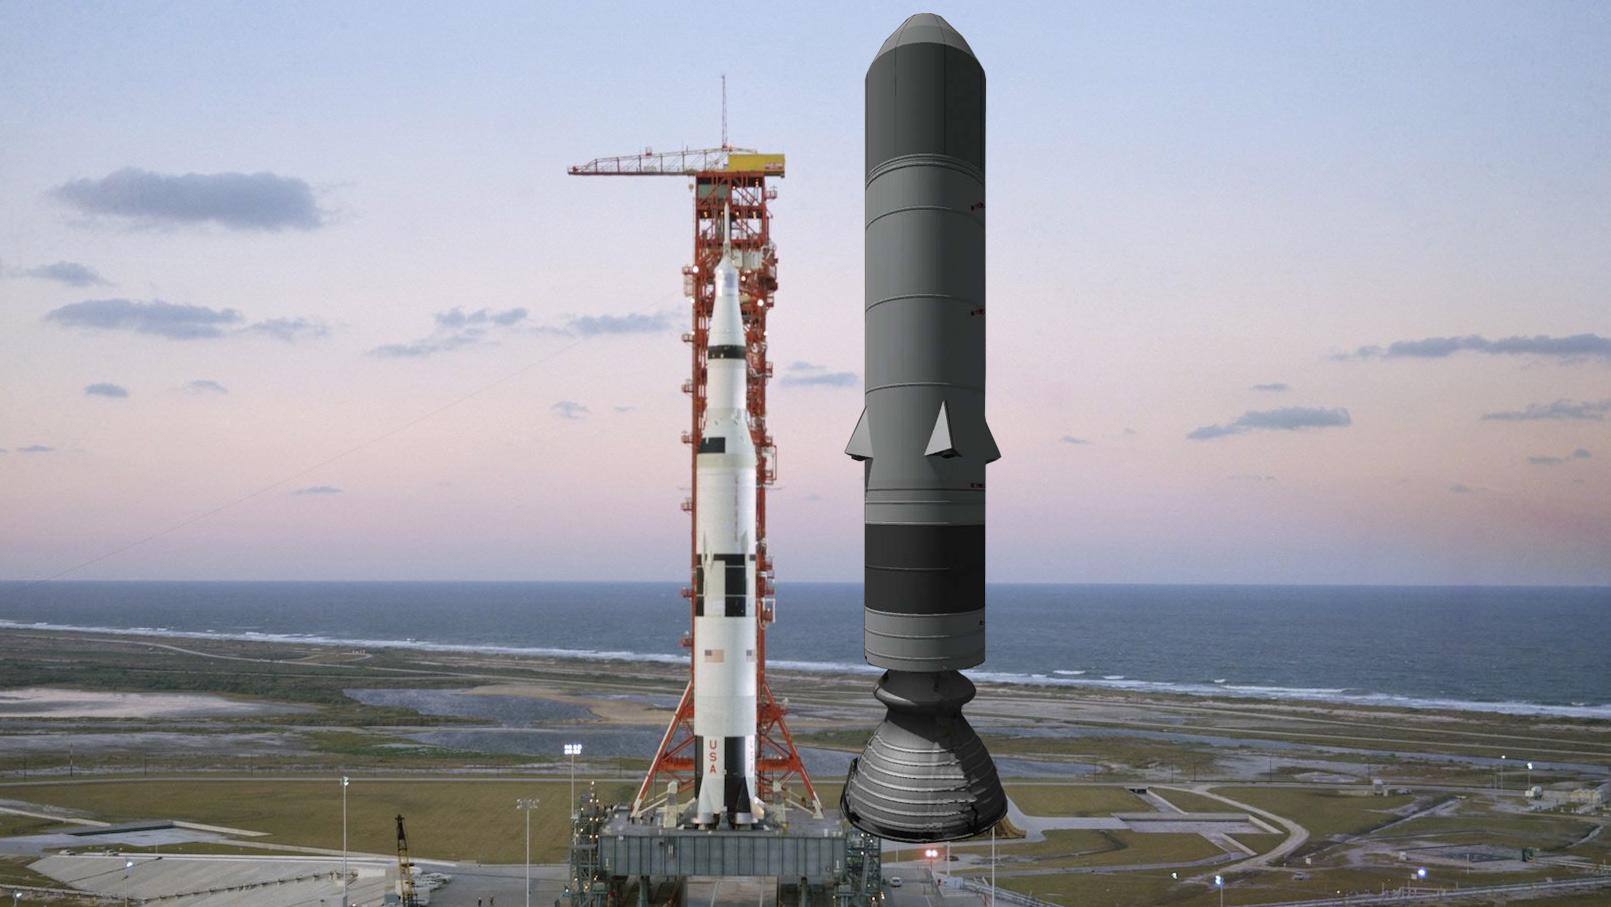 The Biggest Rocket ever Designed? - The Sea Dragon ...